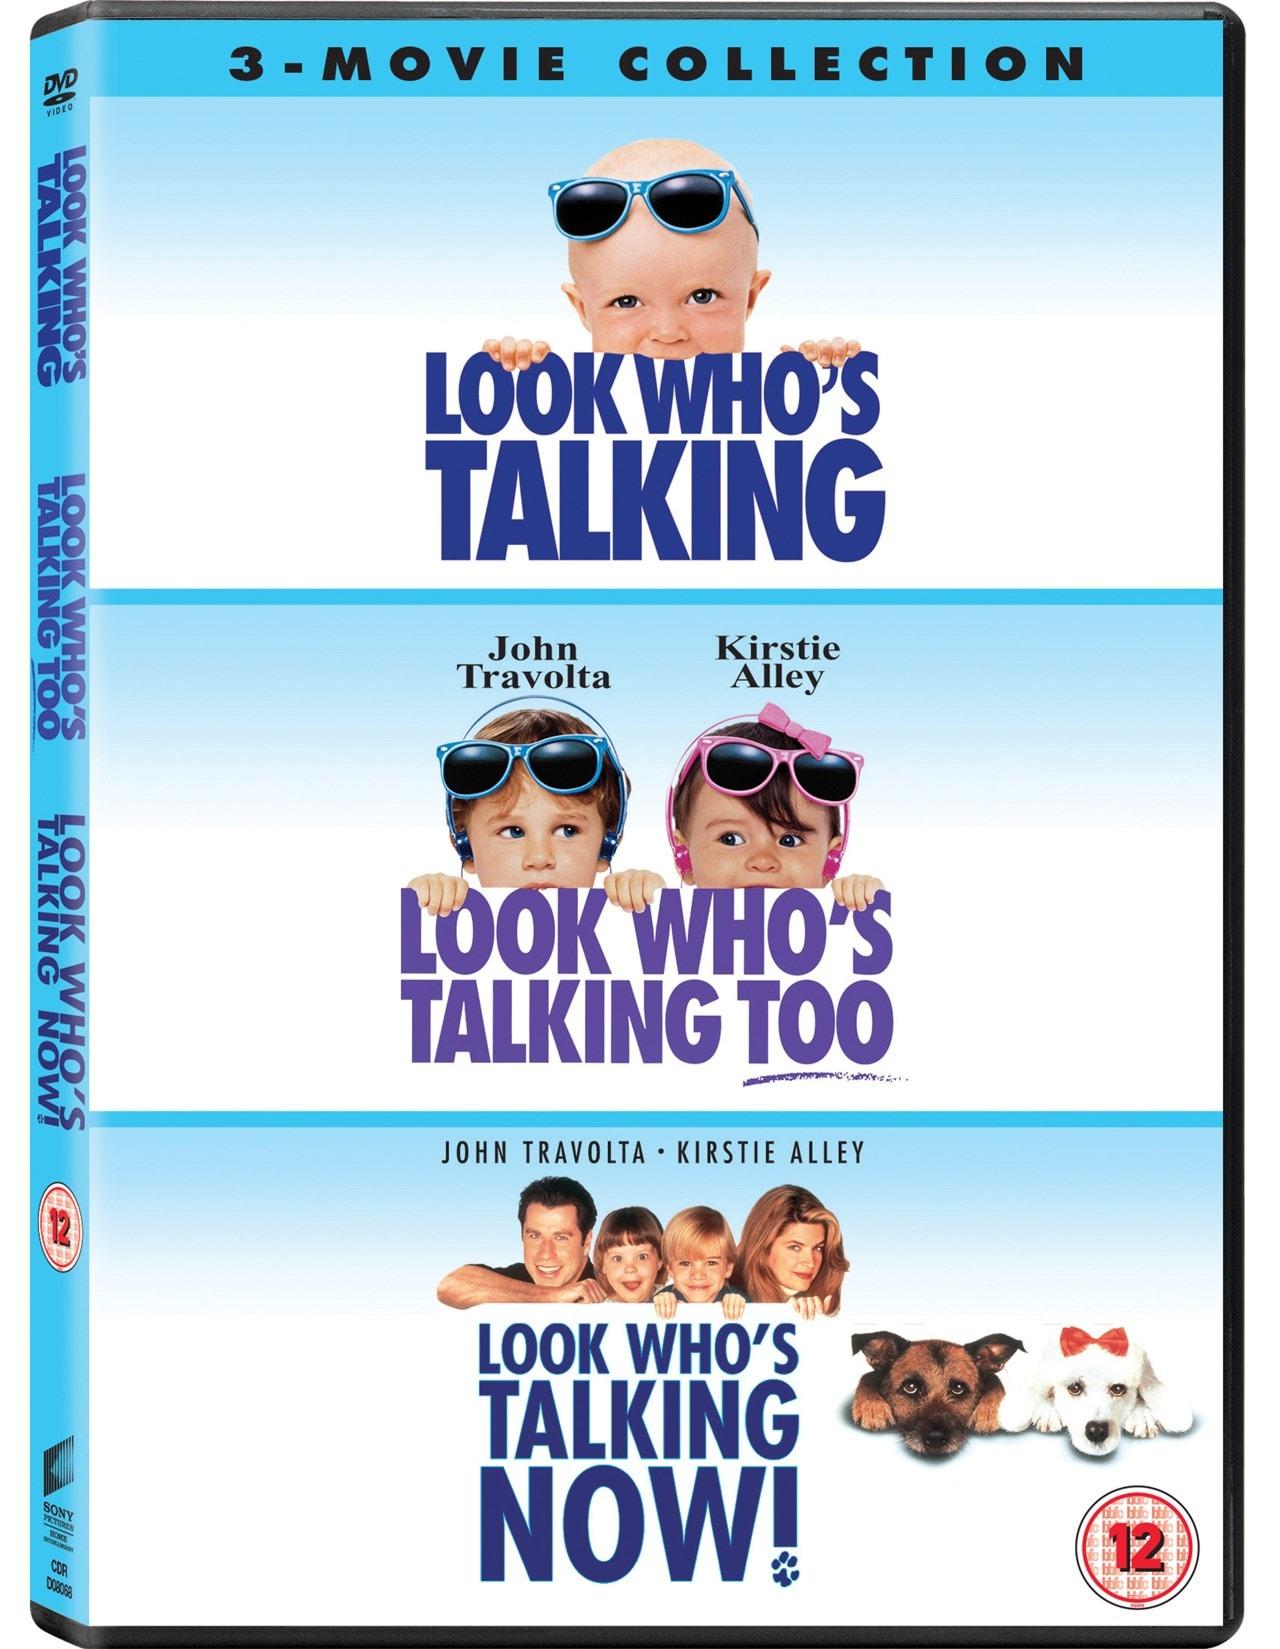 Look Who S Talking Look Who S Talking Too Look Who S Talking Now Dvd Box Set Free Shipping Over 20 Hmv Store